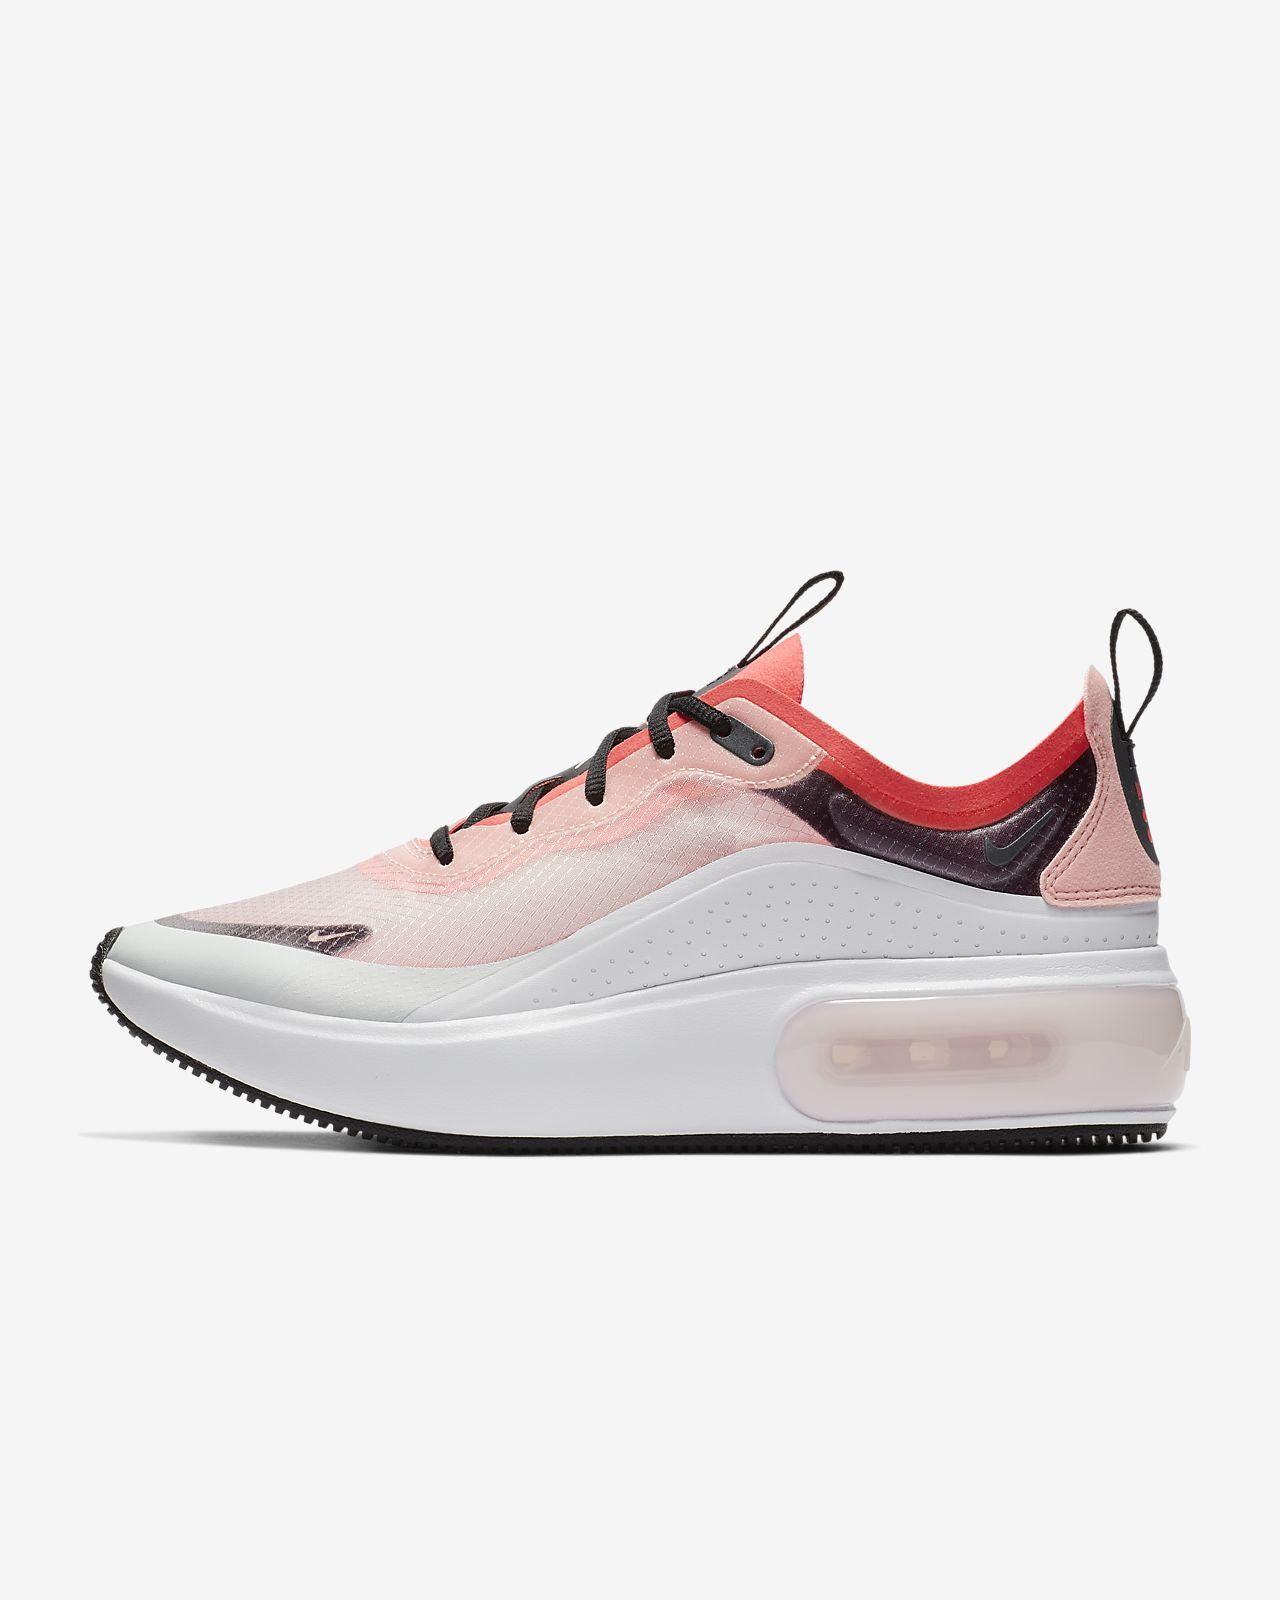 595fb391243 Dámská bota Nike Air Max Dia SE QS. Nike.com CZ